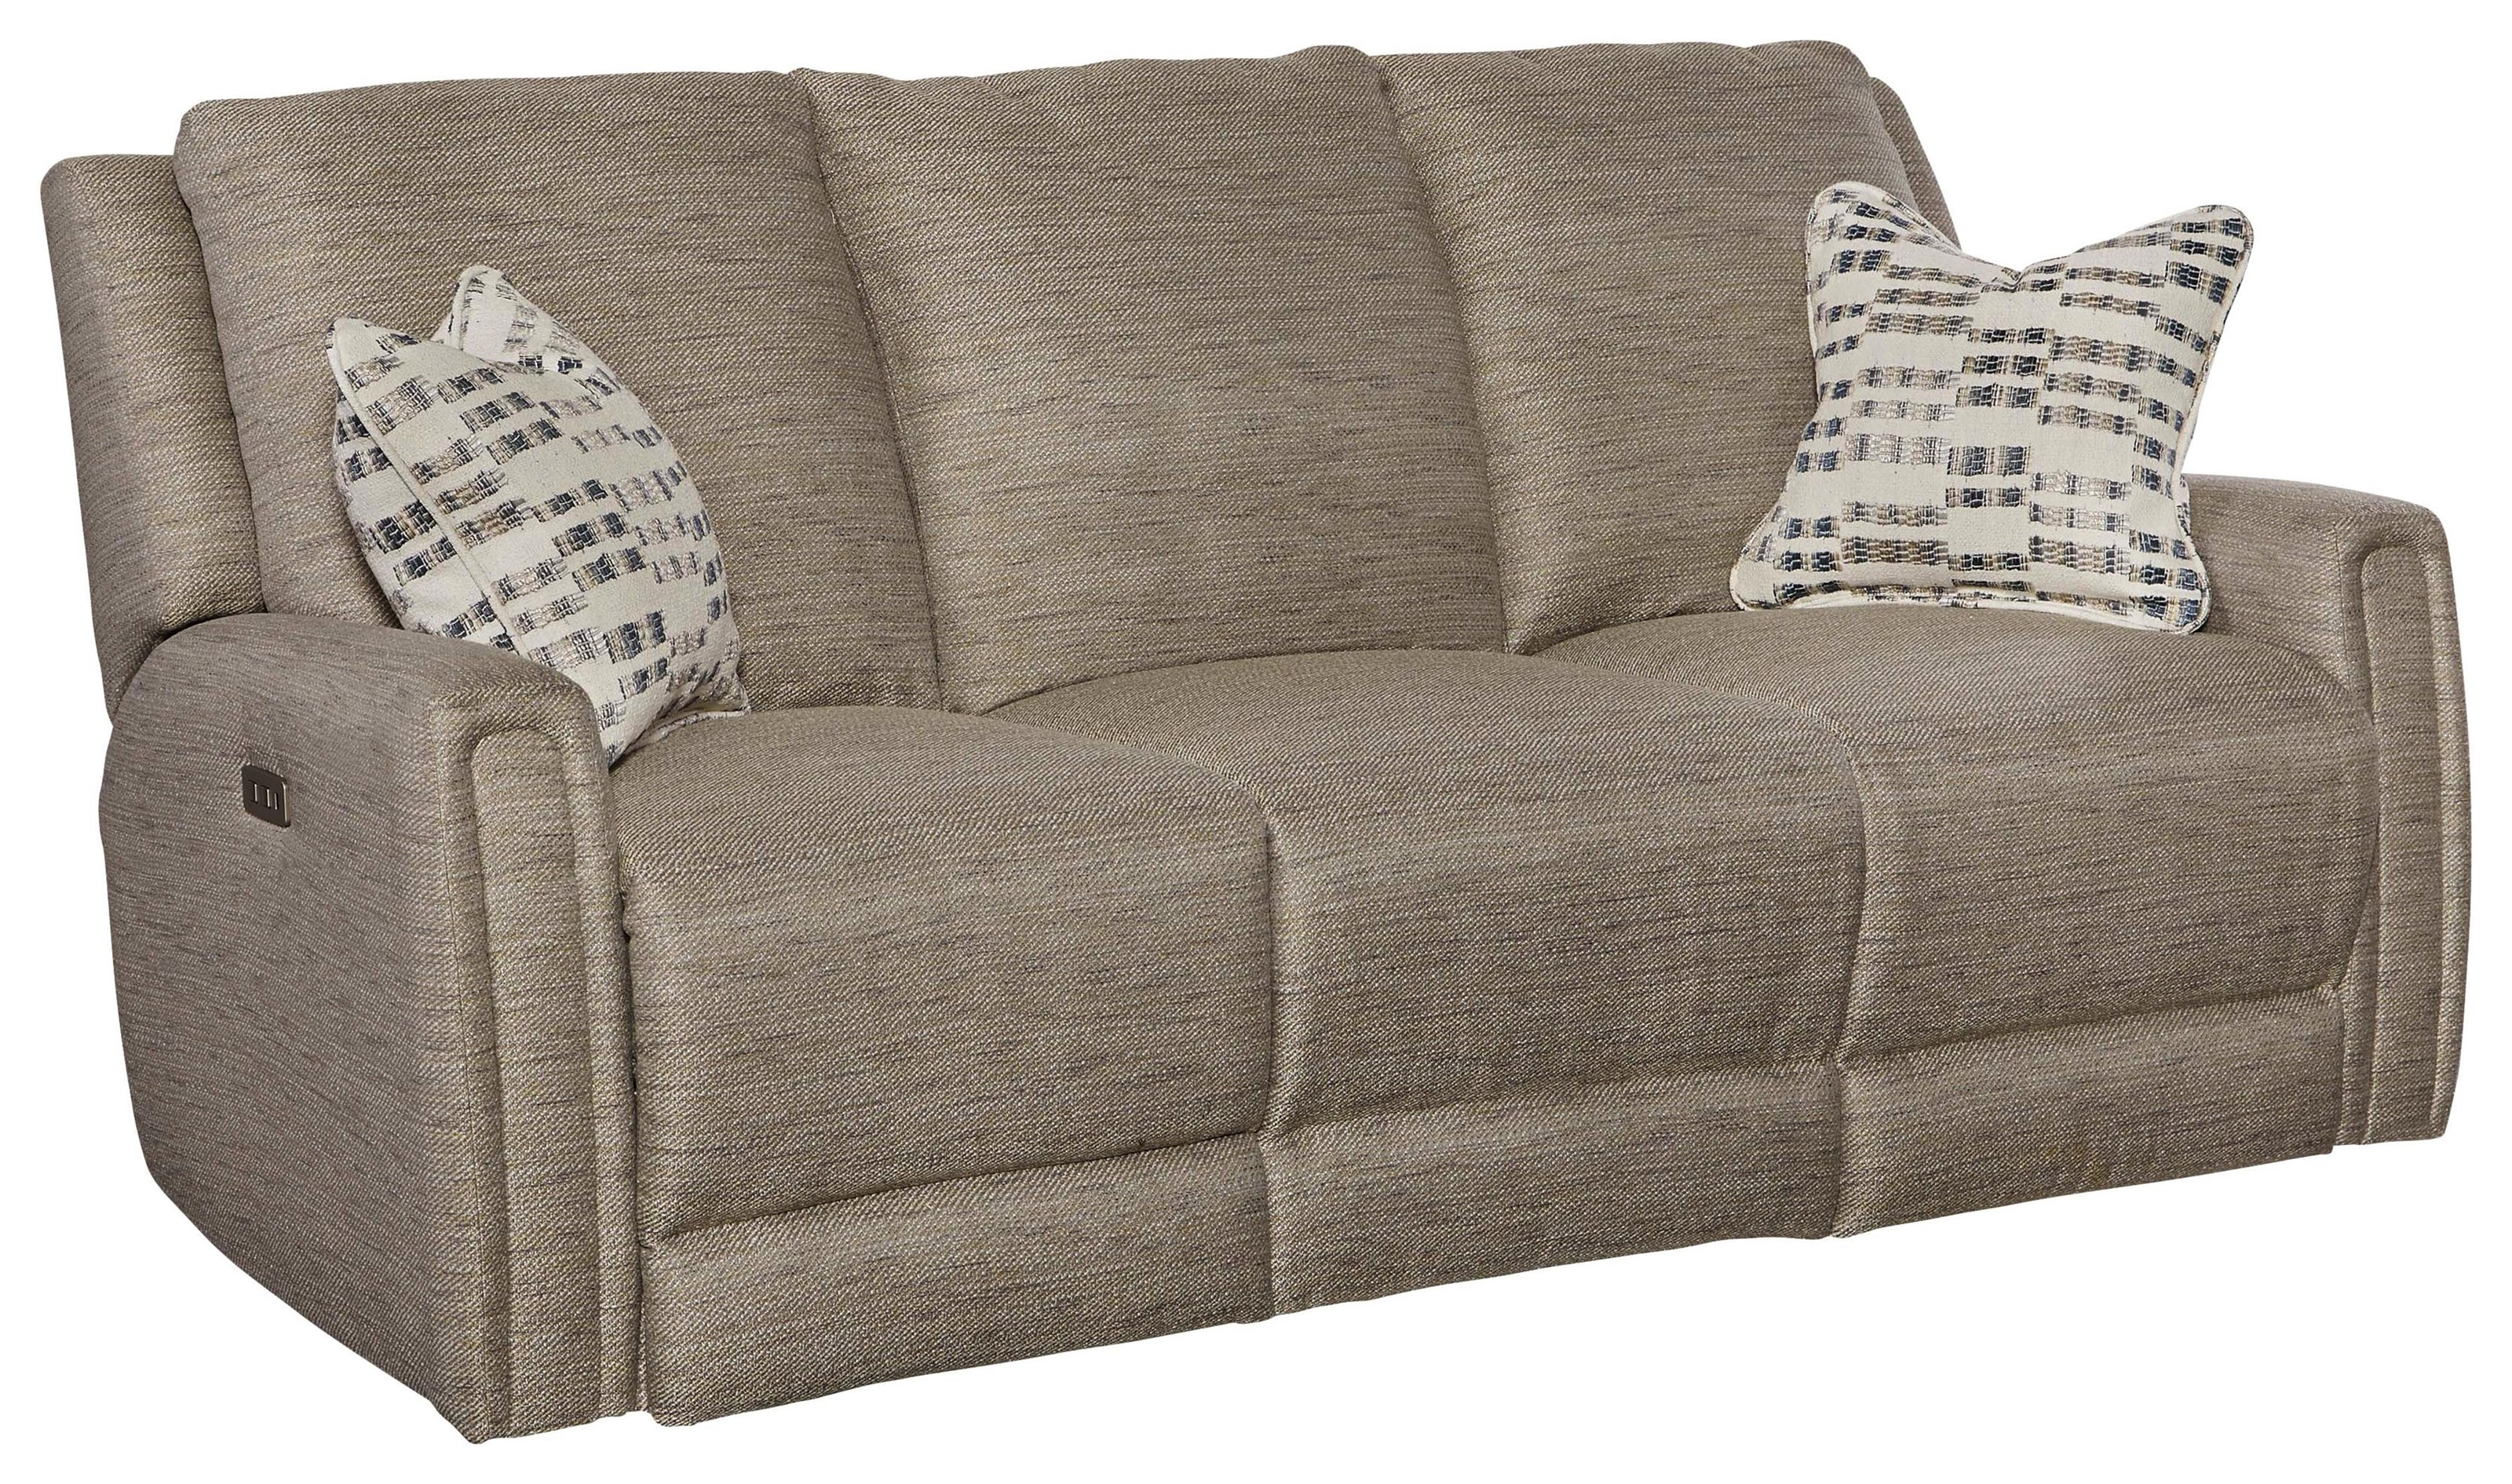 Wonderwall Manual Sofa by Southern Motion at Johnny Janosik